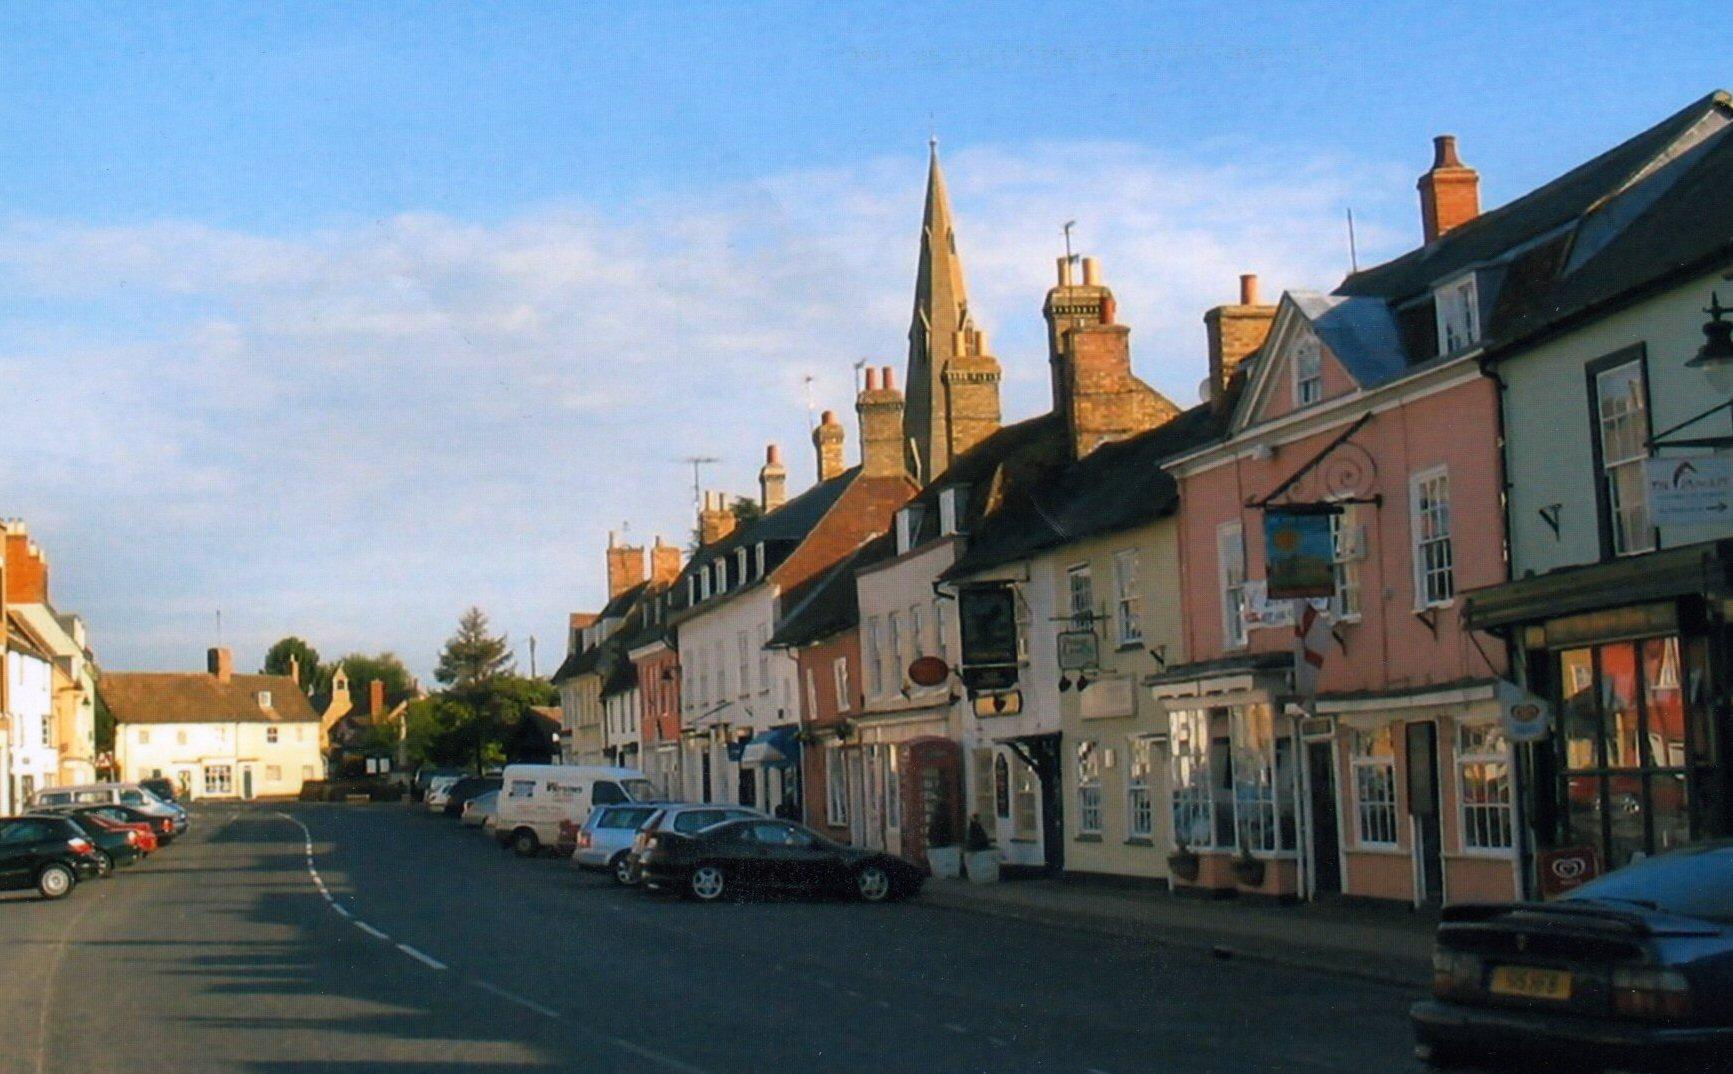 http://standrew-kimbolton.org.uk/wordpress/wp-content/uploads/High-Street-west.jpg